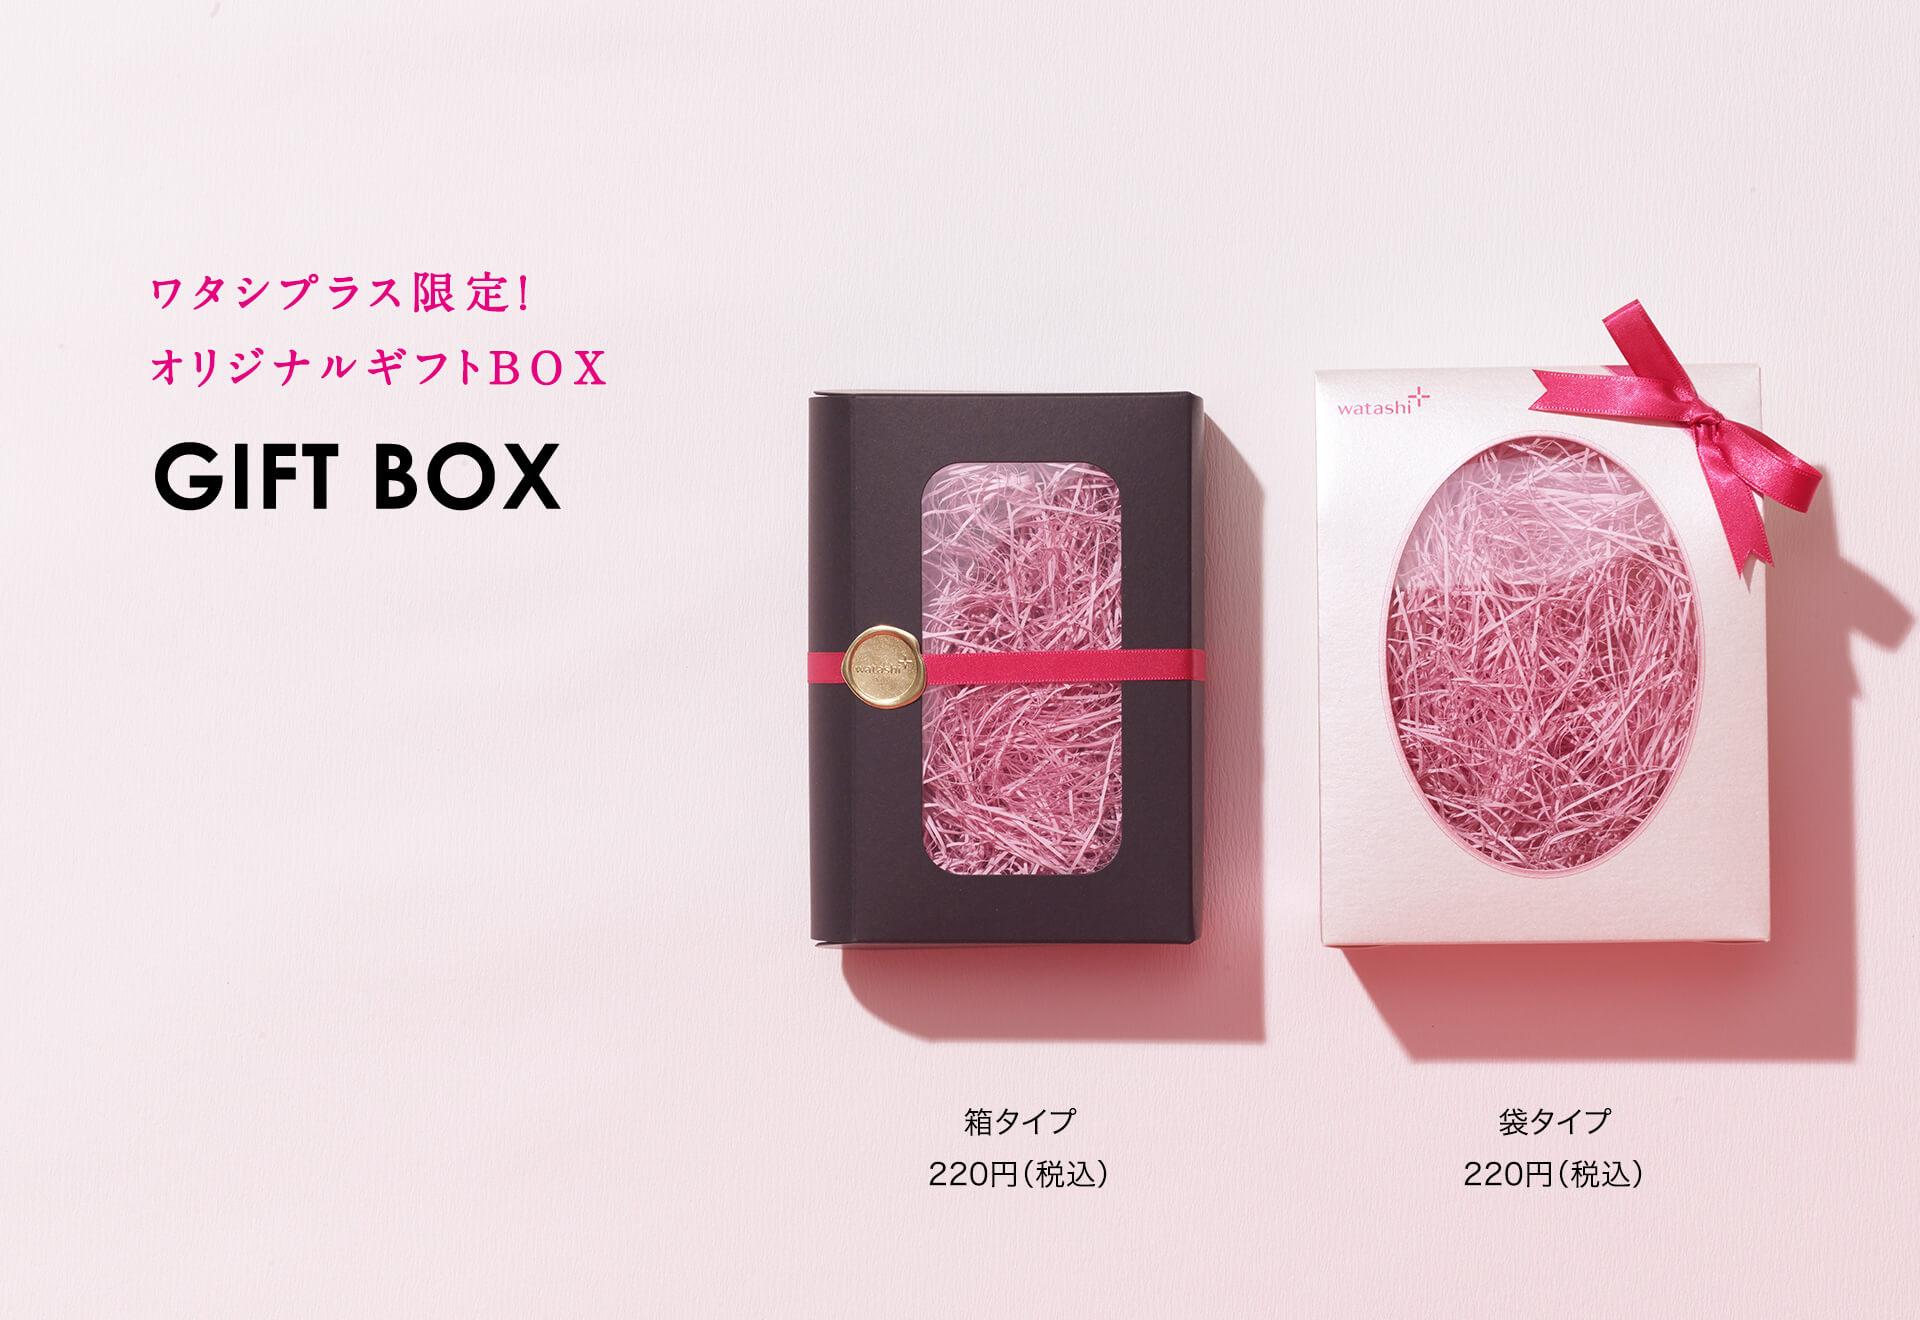 boxgift box negle Gallery